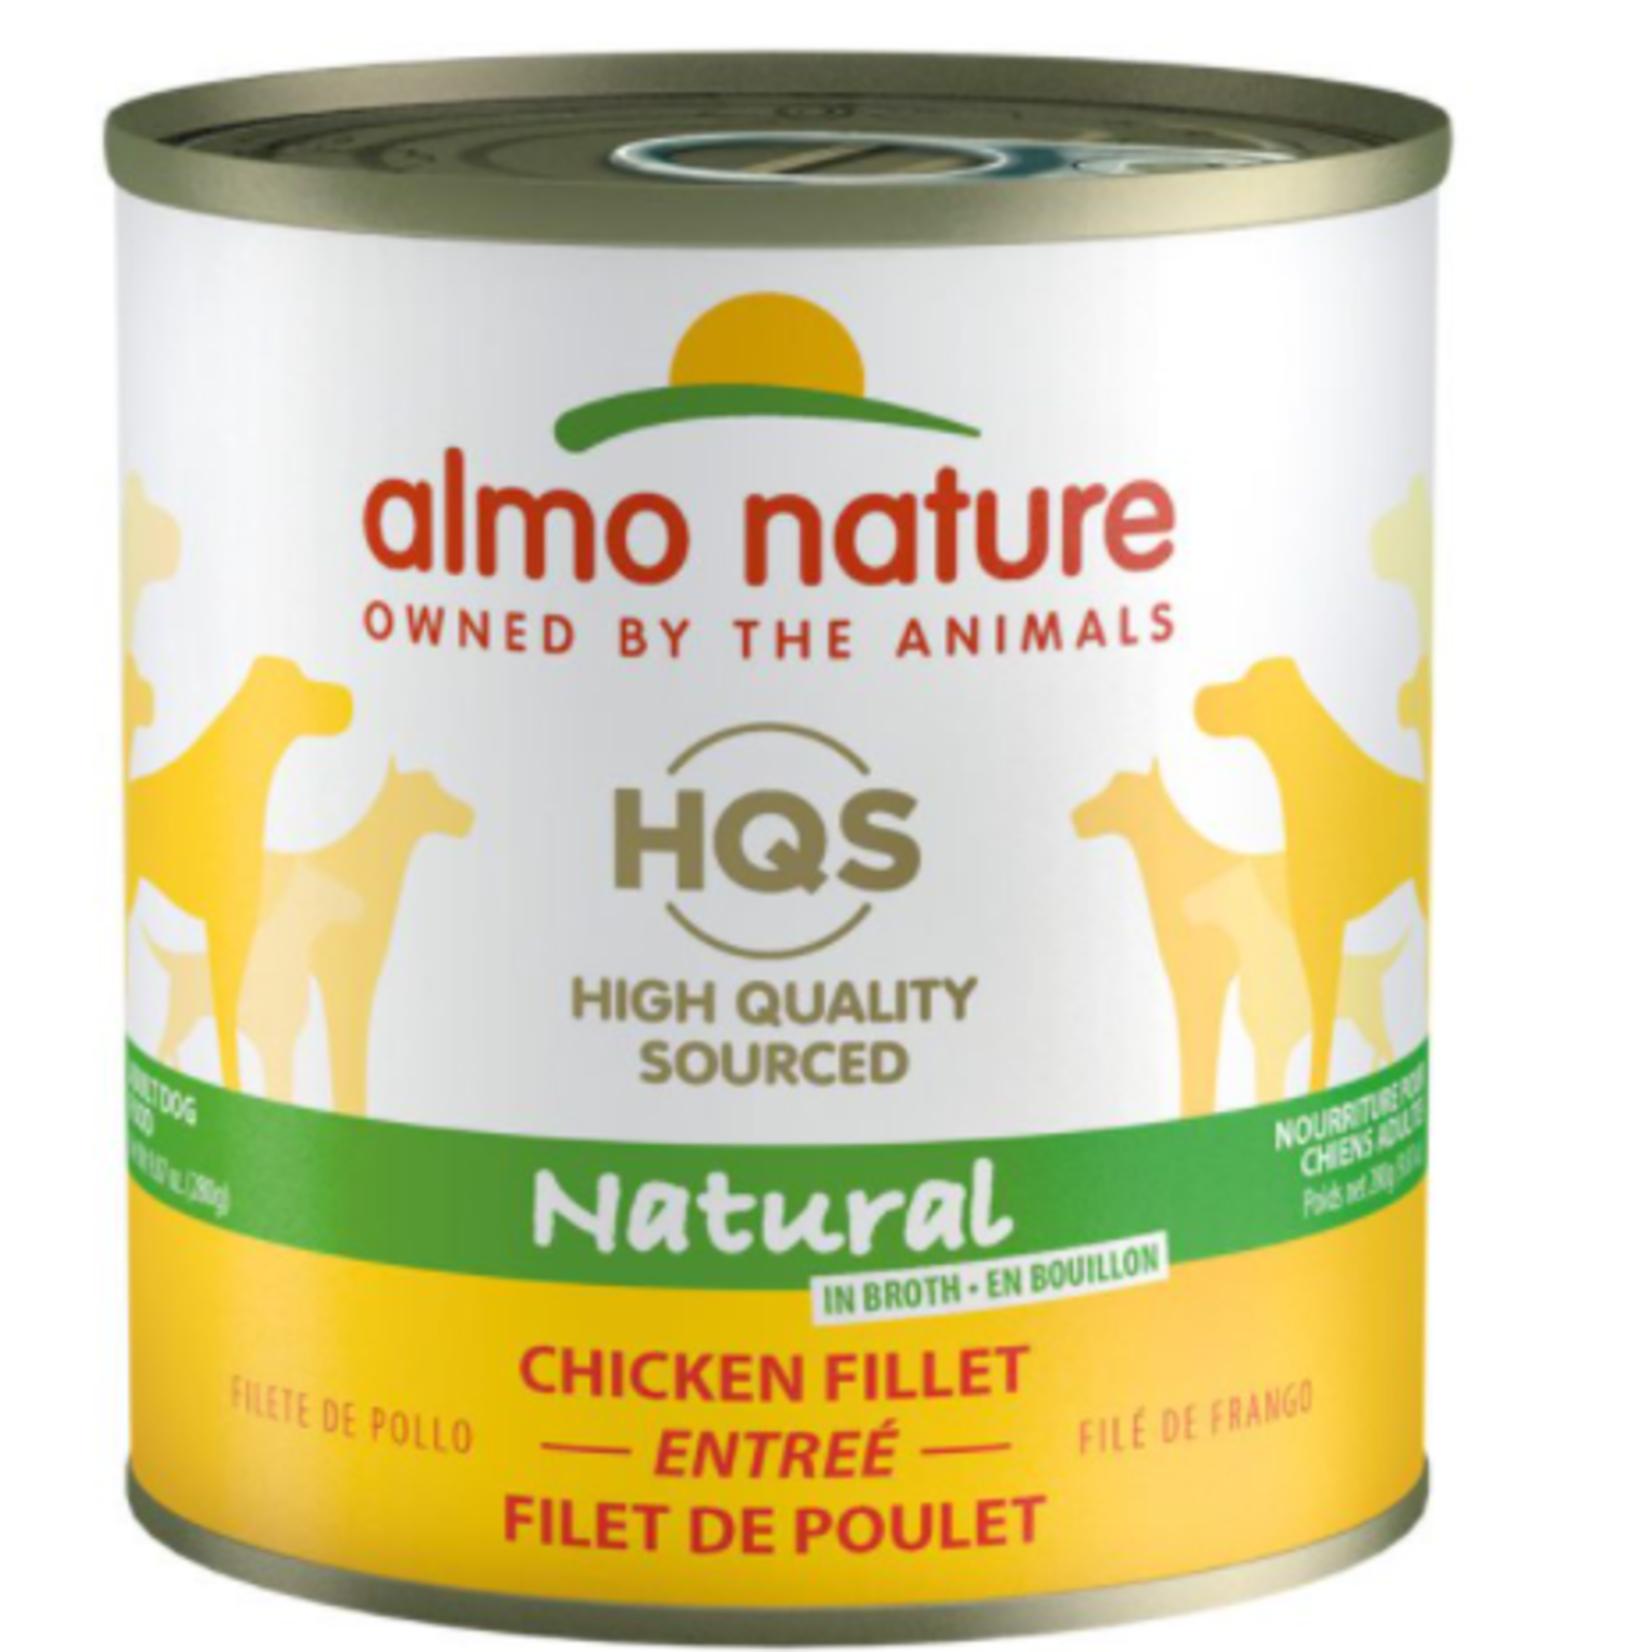 Almo Almo Nature - Chicken fillet - 280g